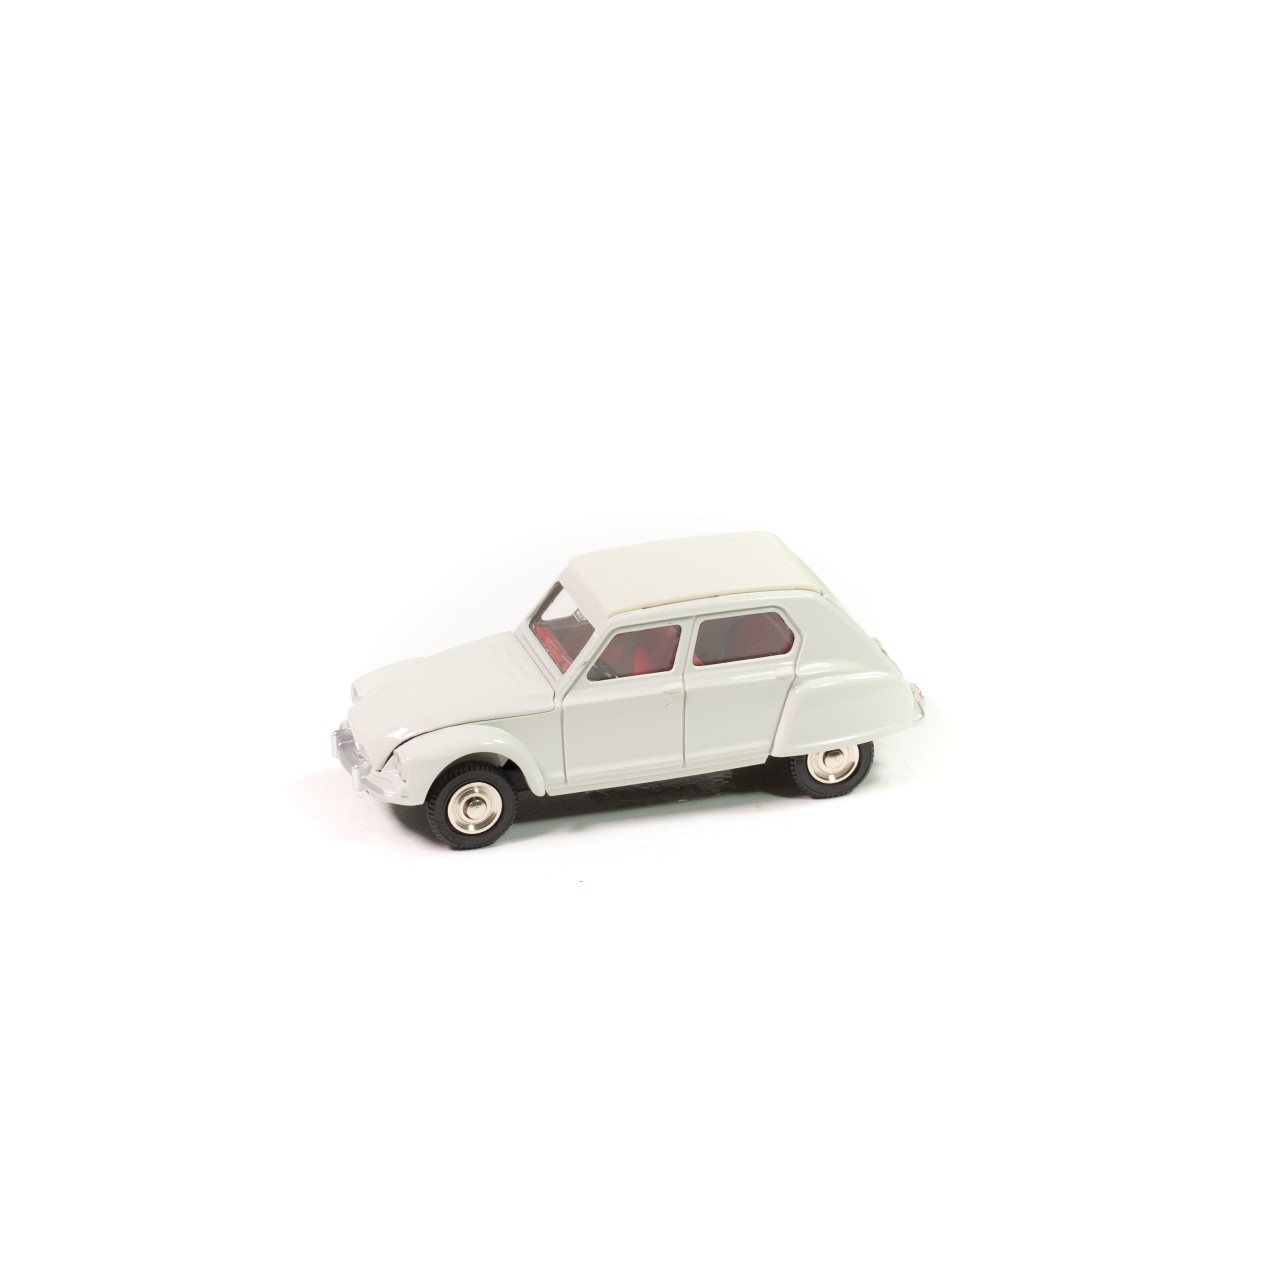 Dtf622-dinky toys-simca 1100-hatchback 1407//1450